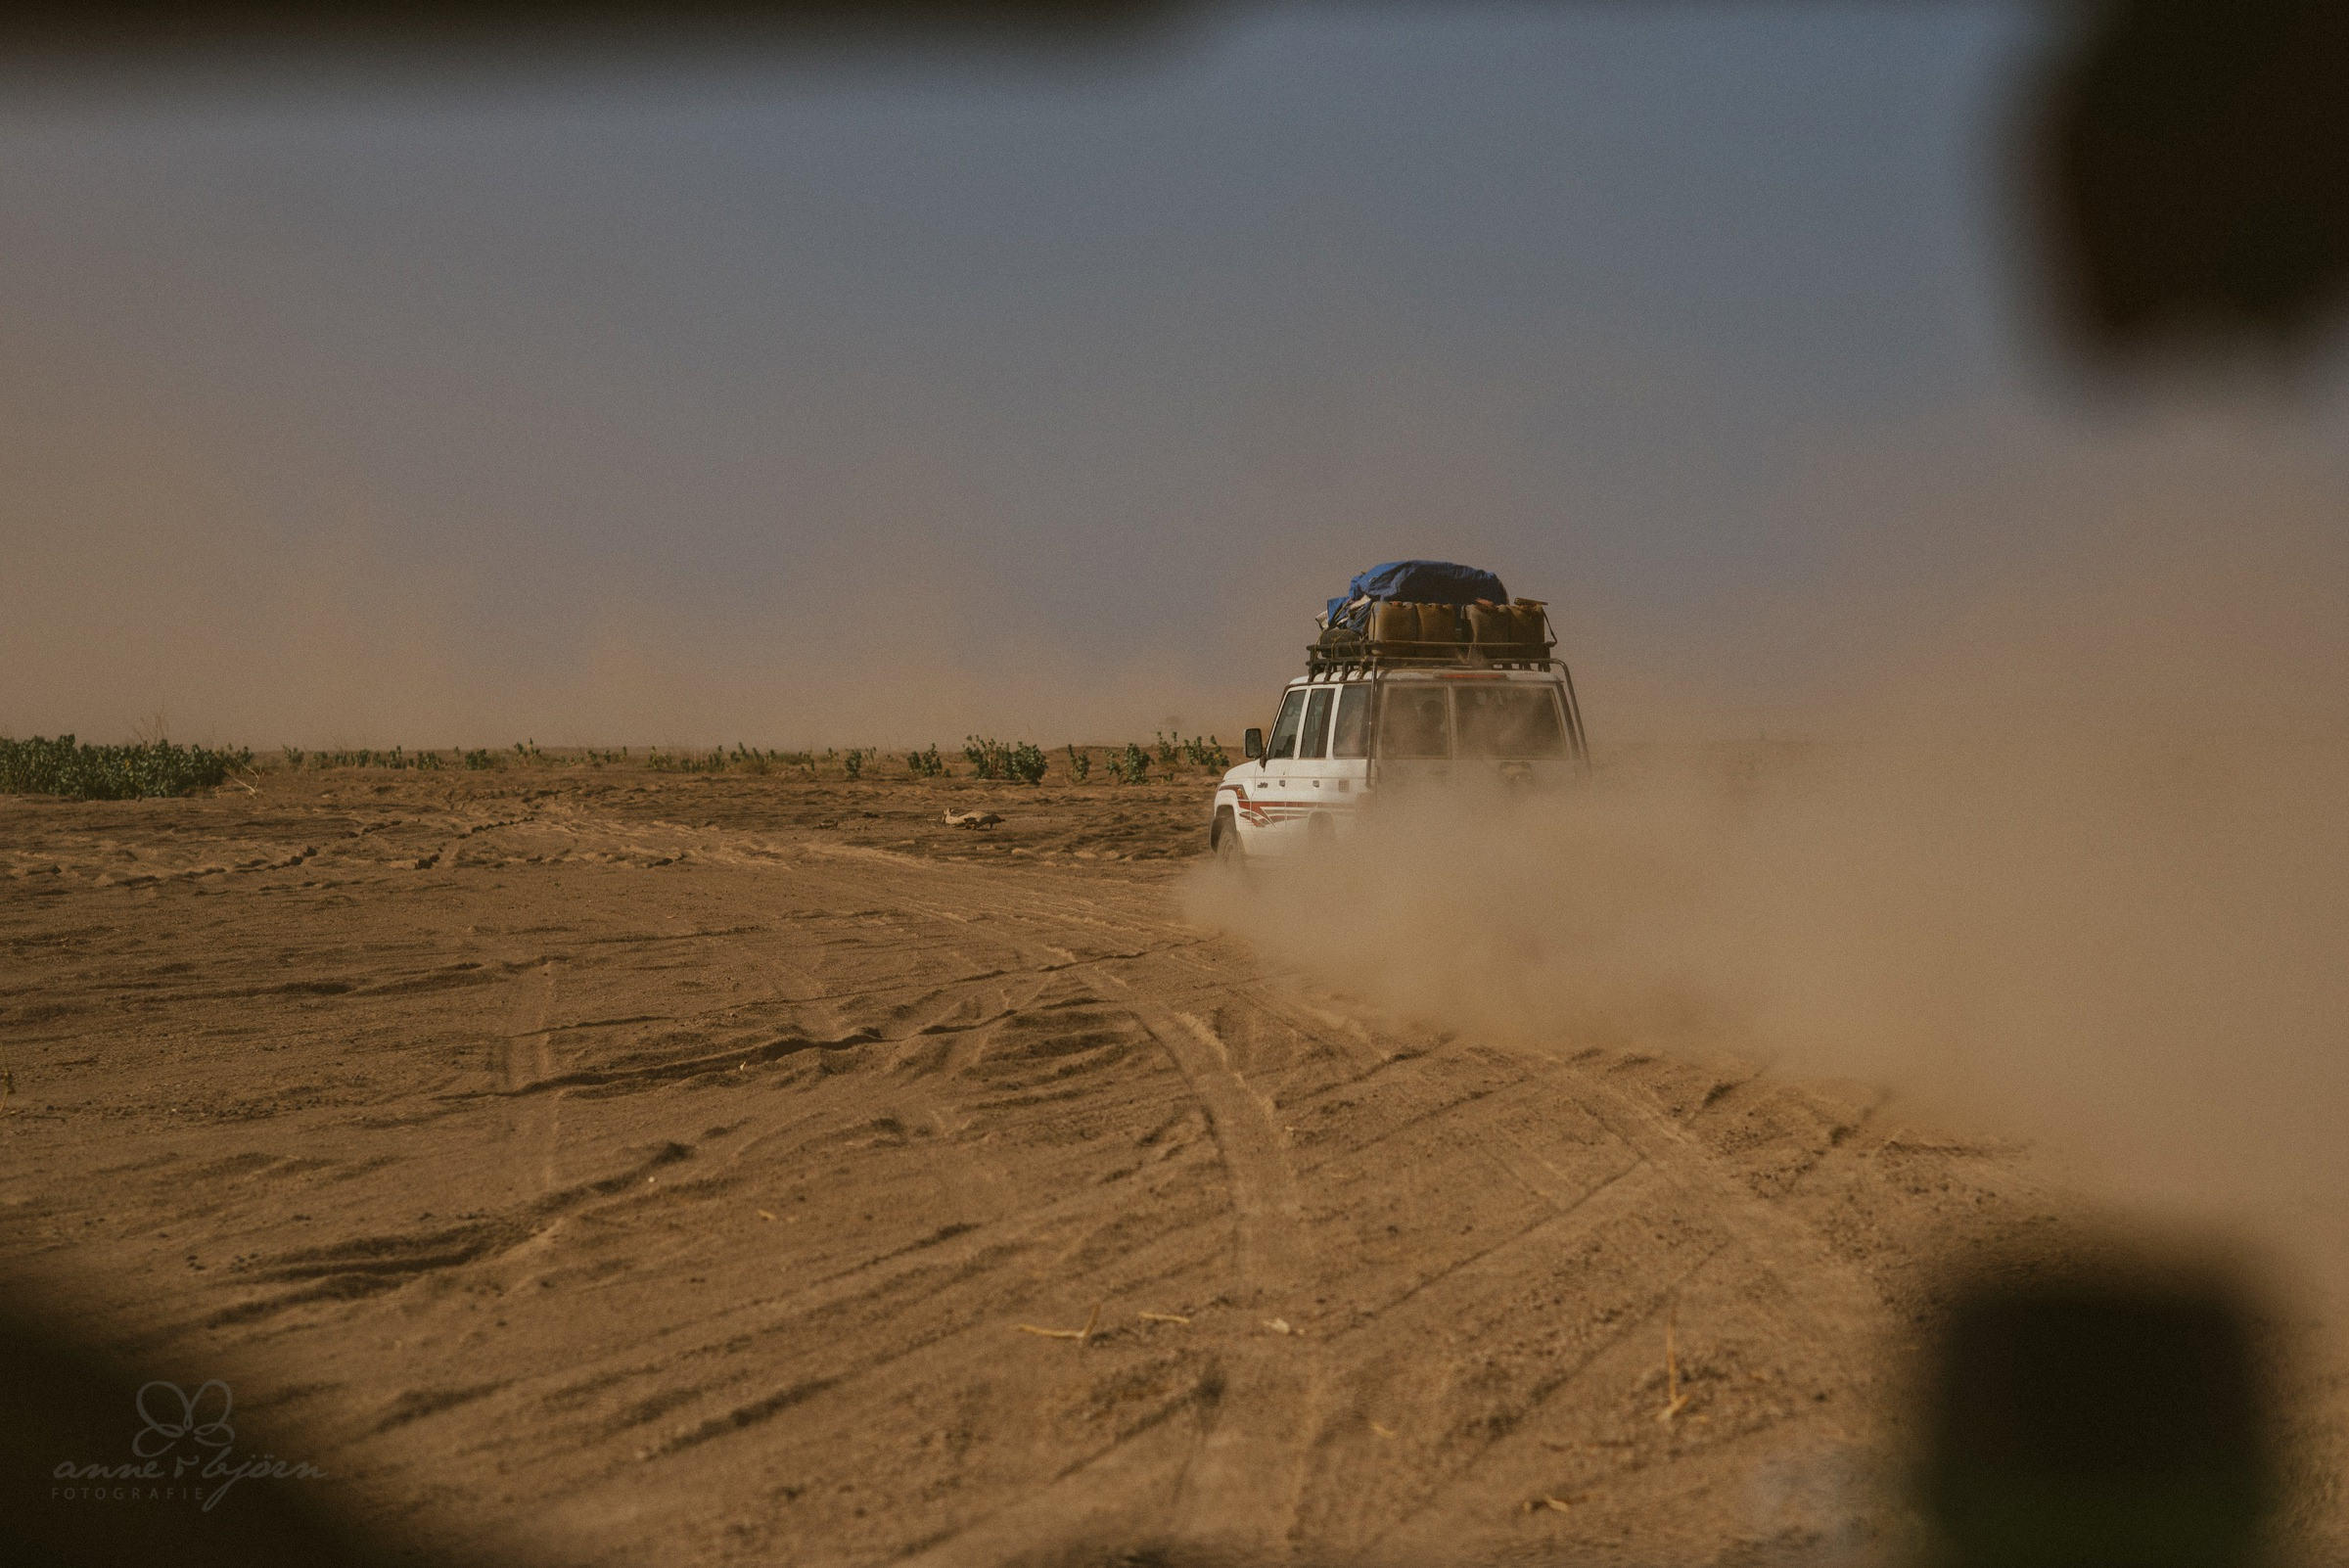 Jeep, Fahrt, Wüste, Abenteuer, Danakil